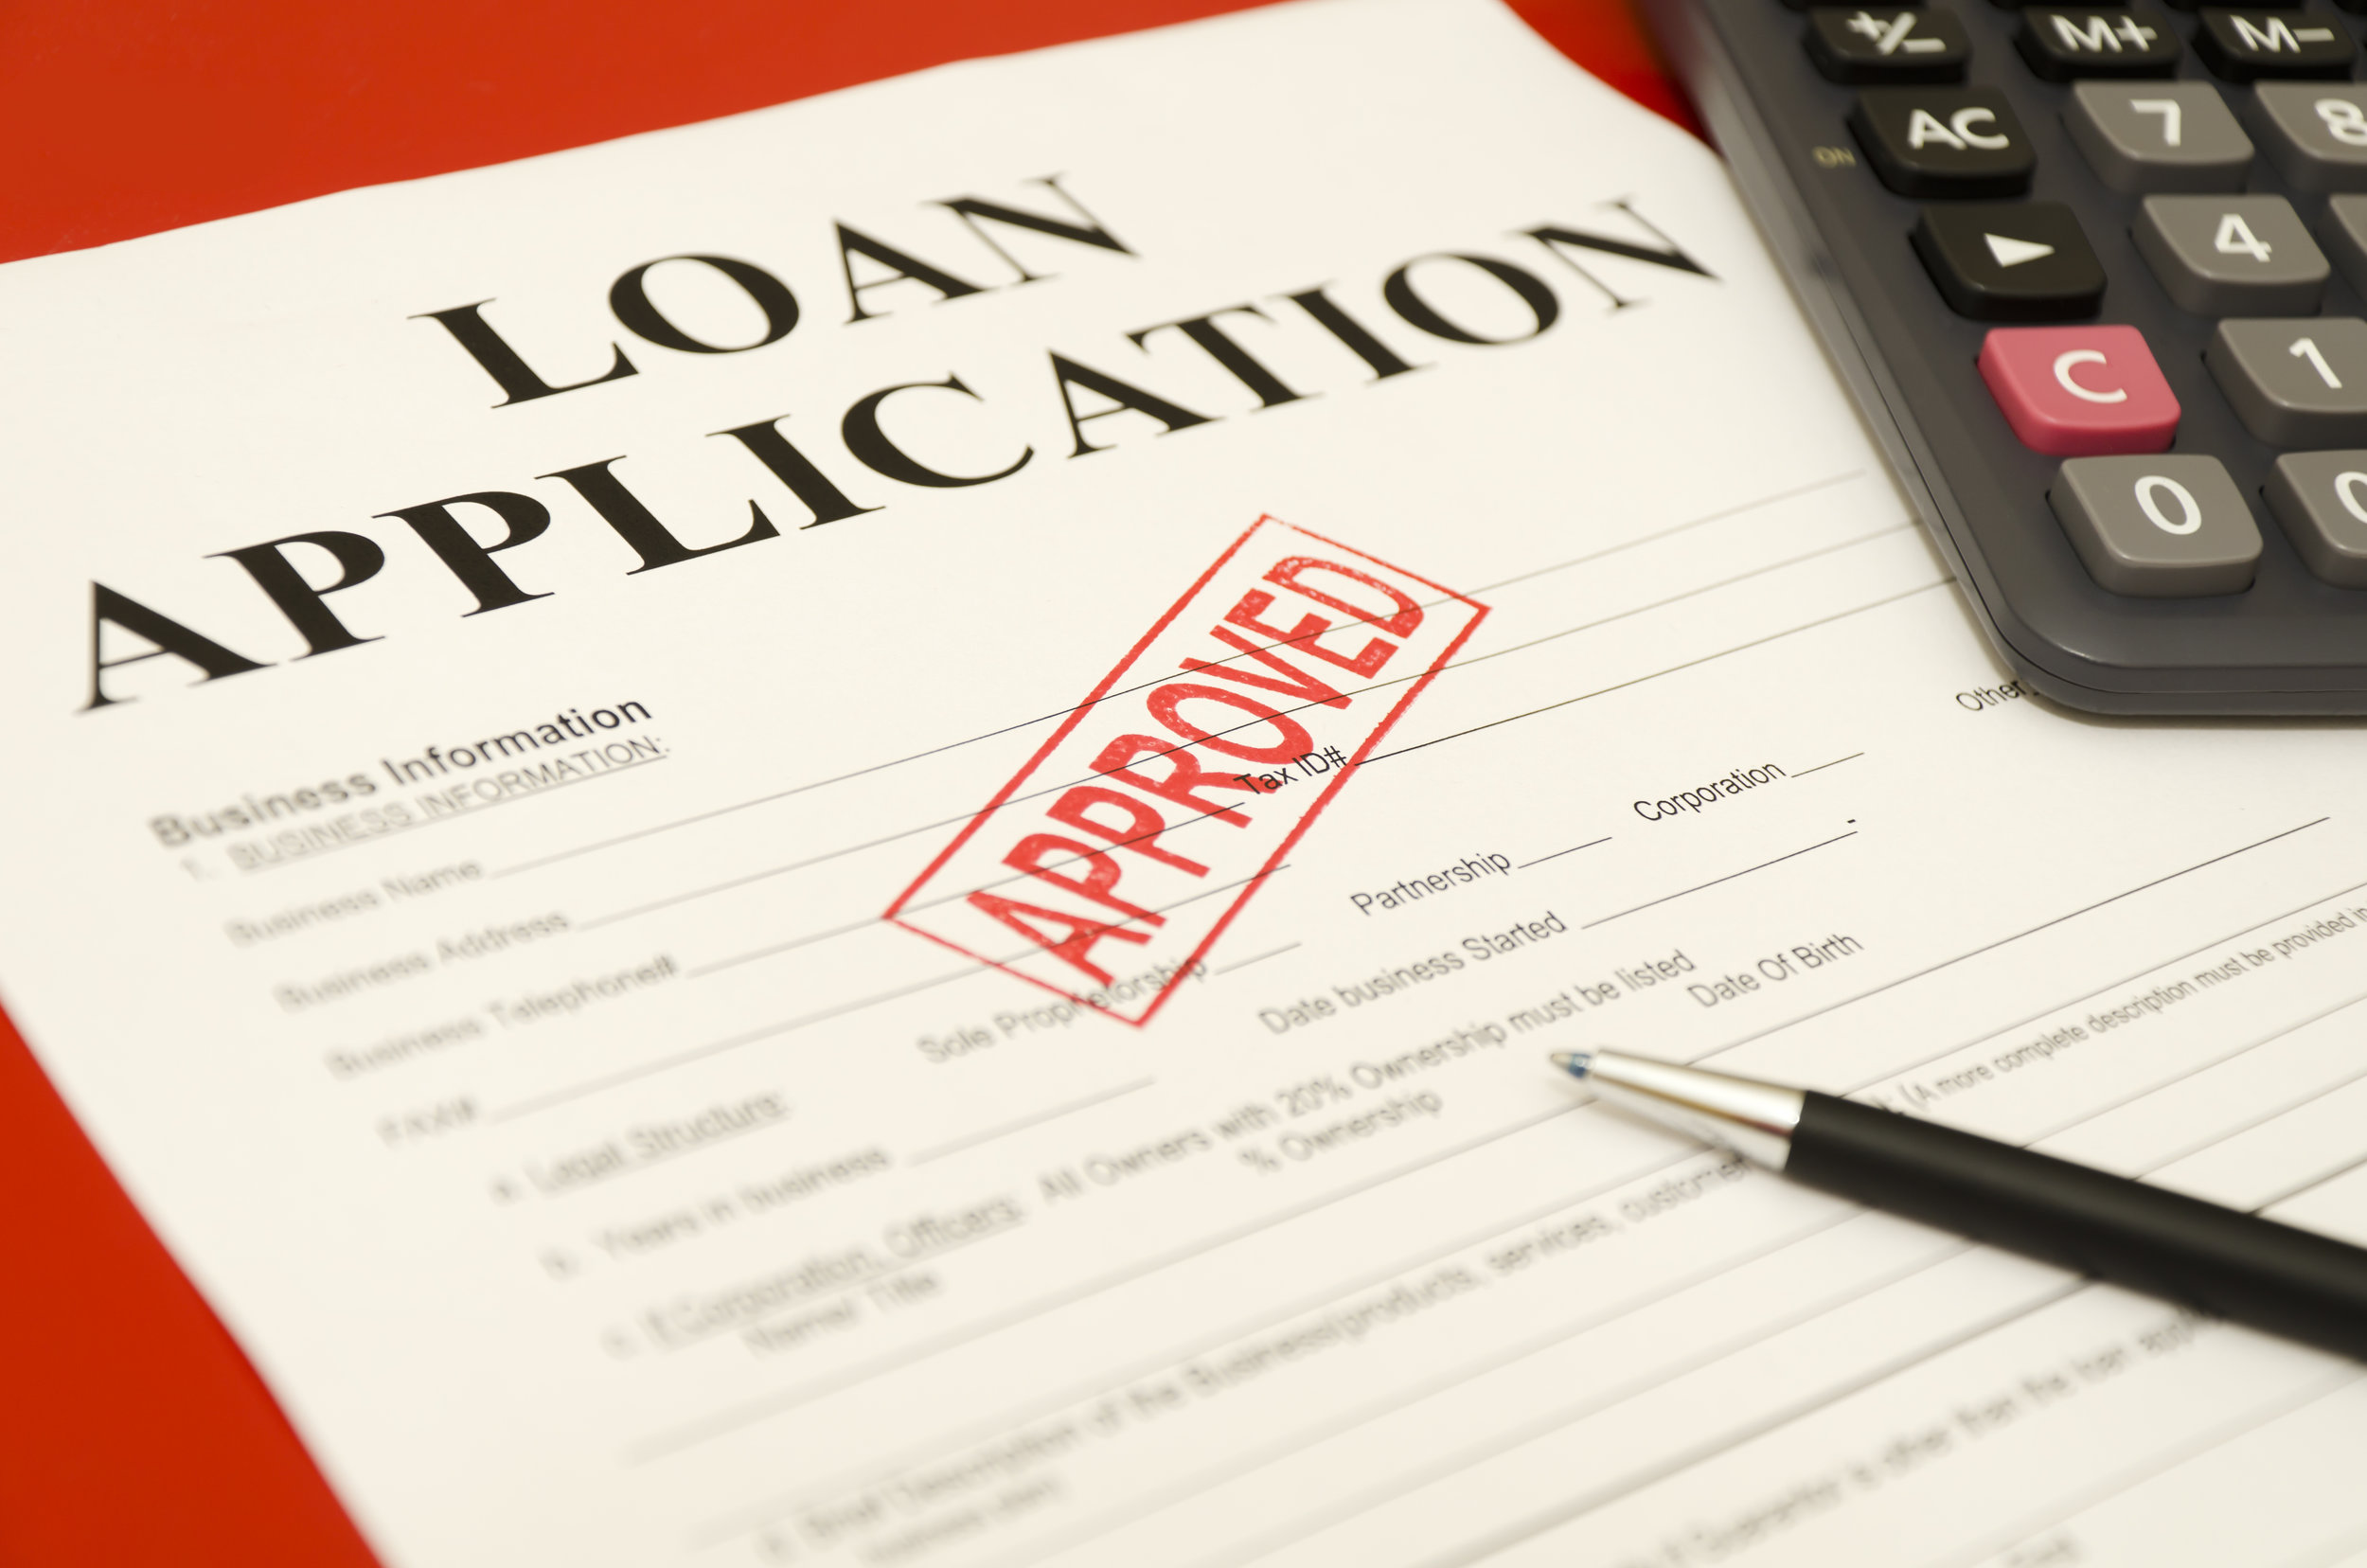 glassboro small business loans